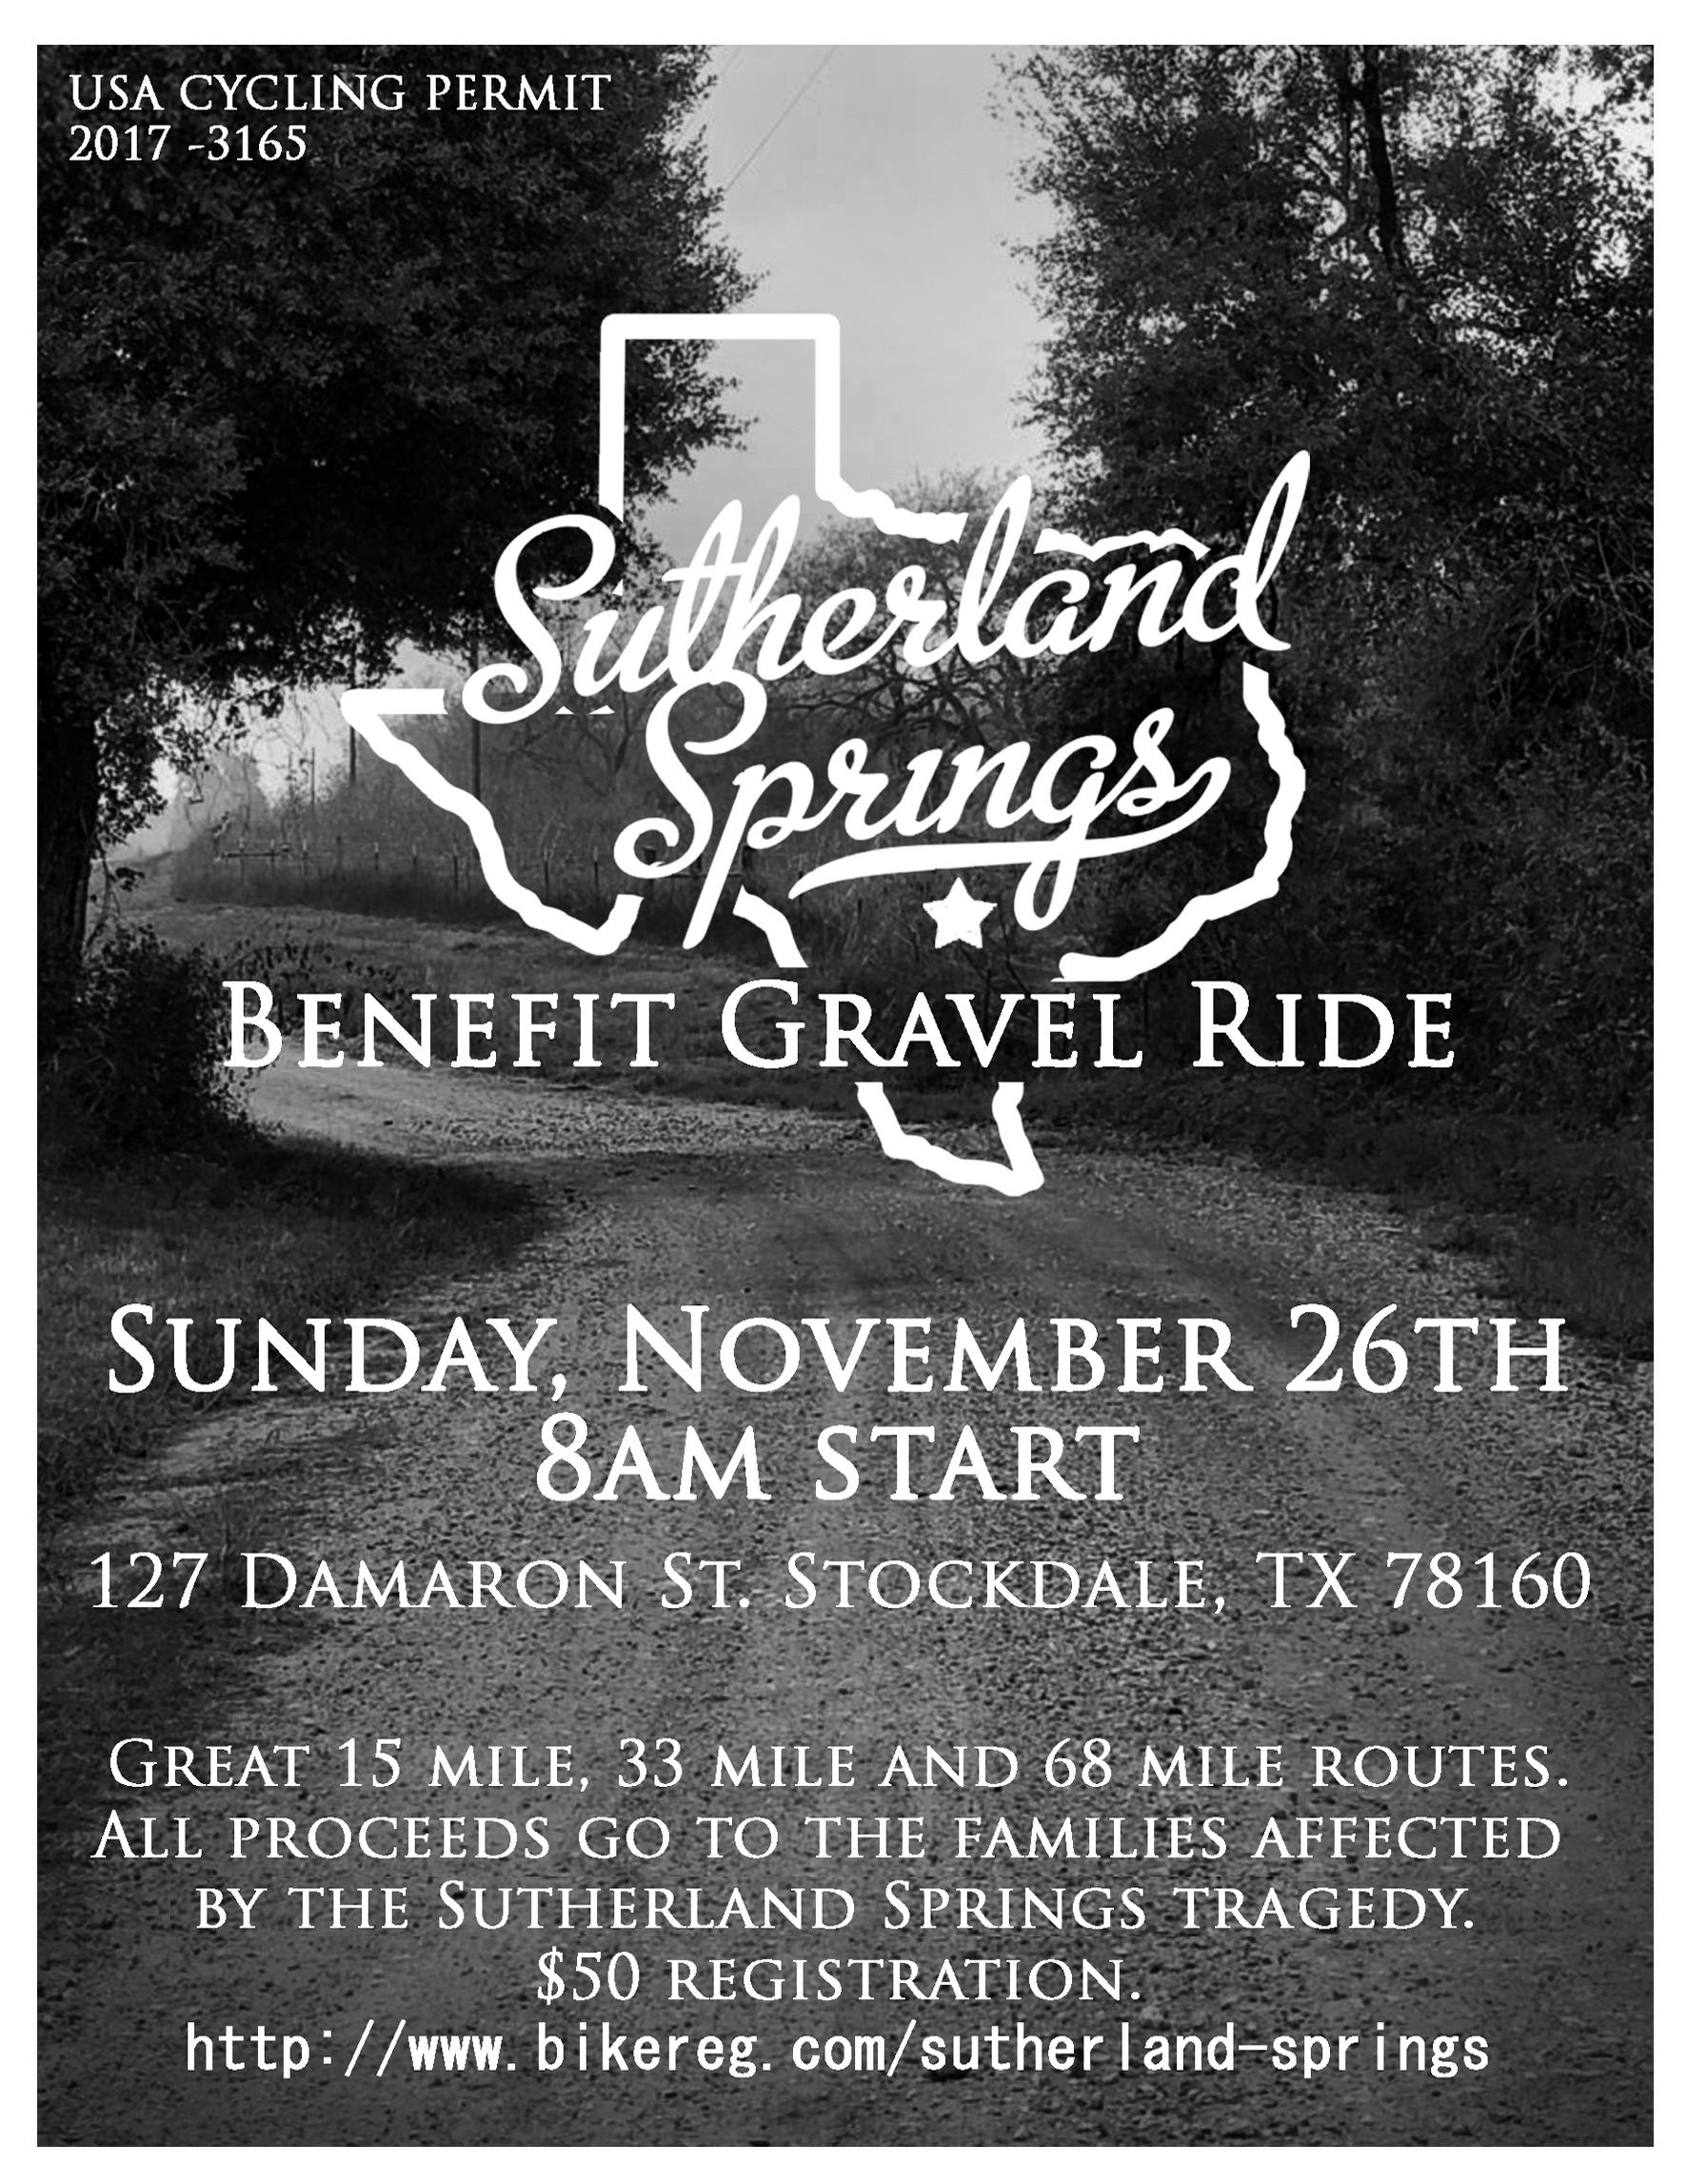 Sutherland Springs Benefit Gravel Ride full